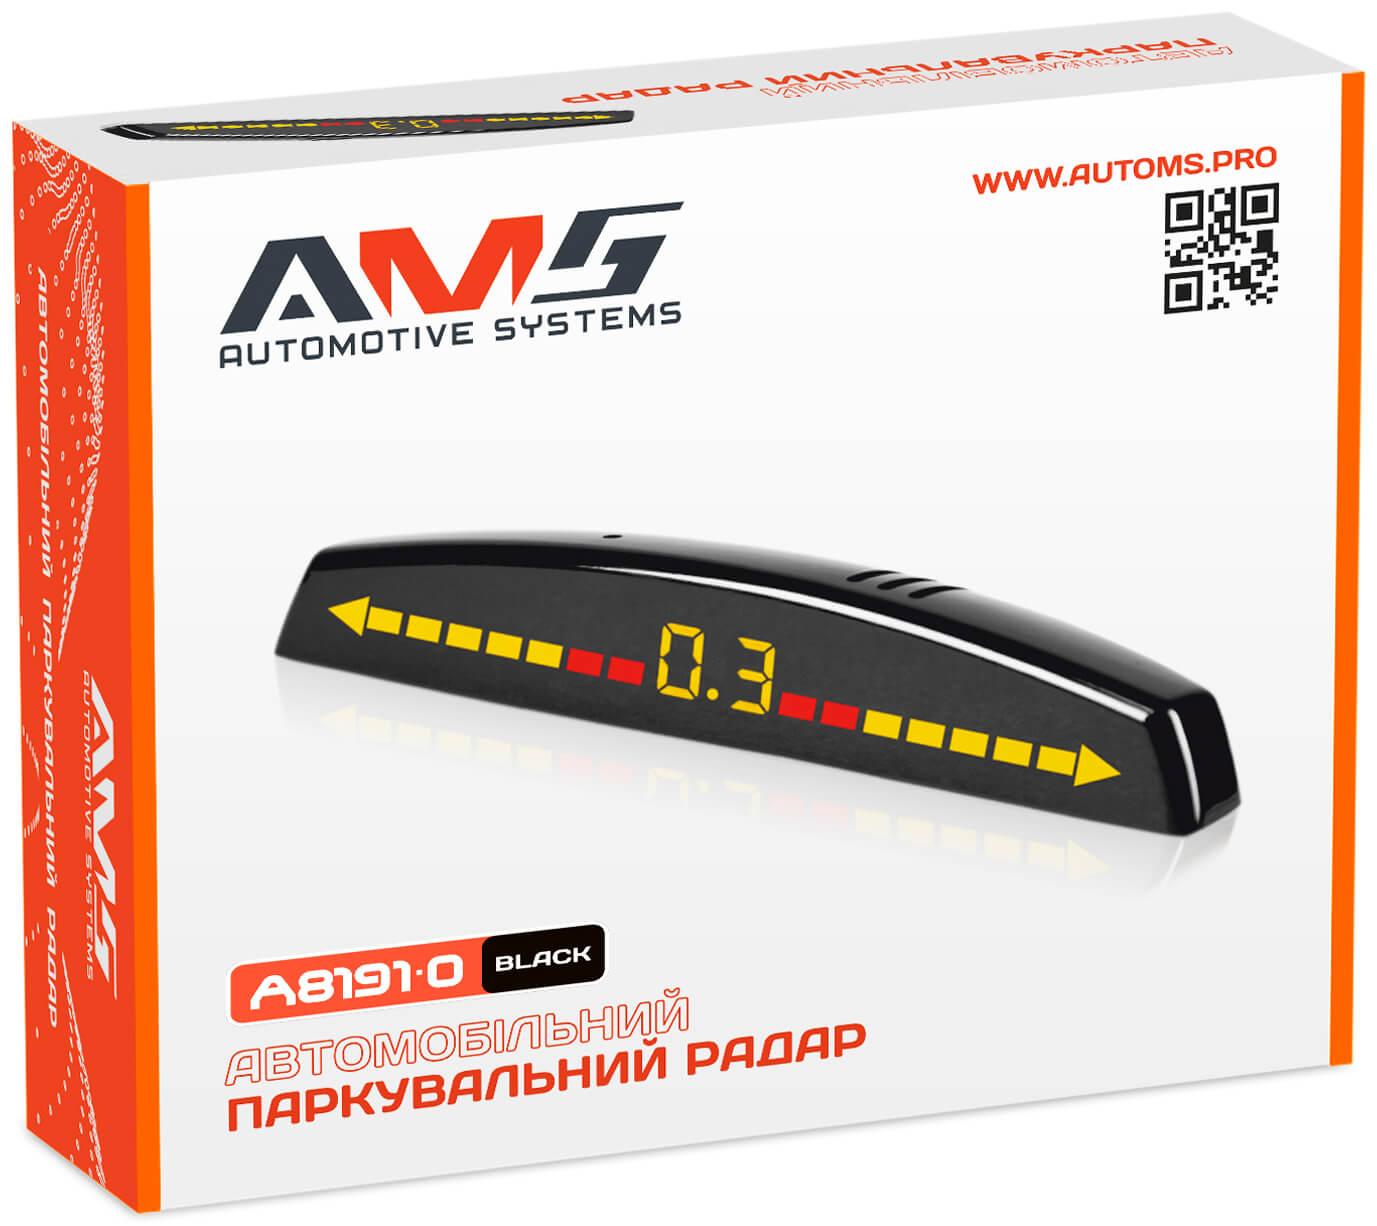 AMS A8191-0 Black